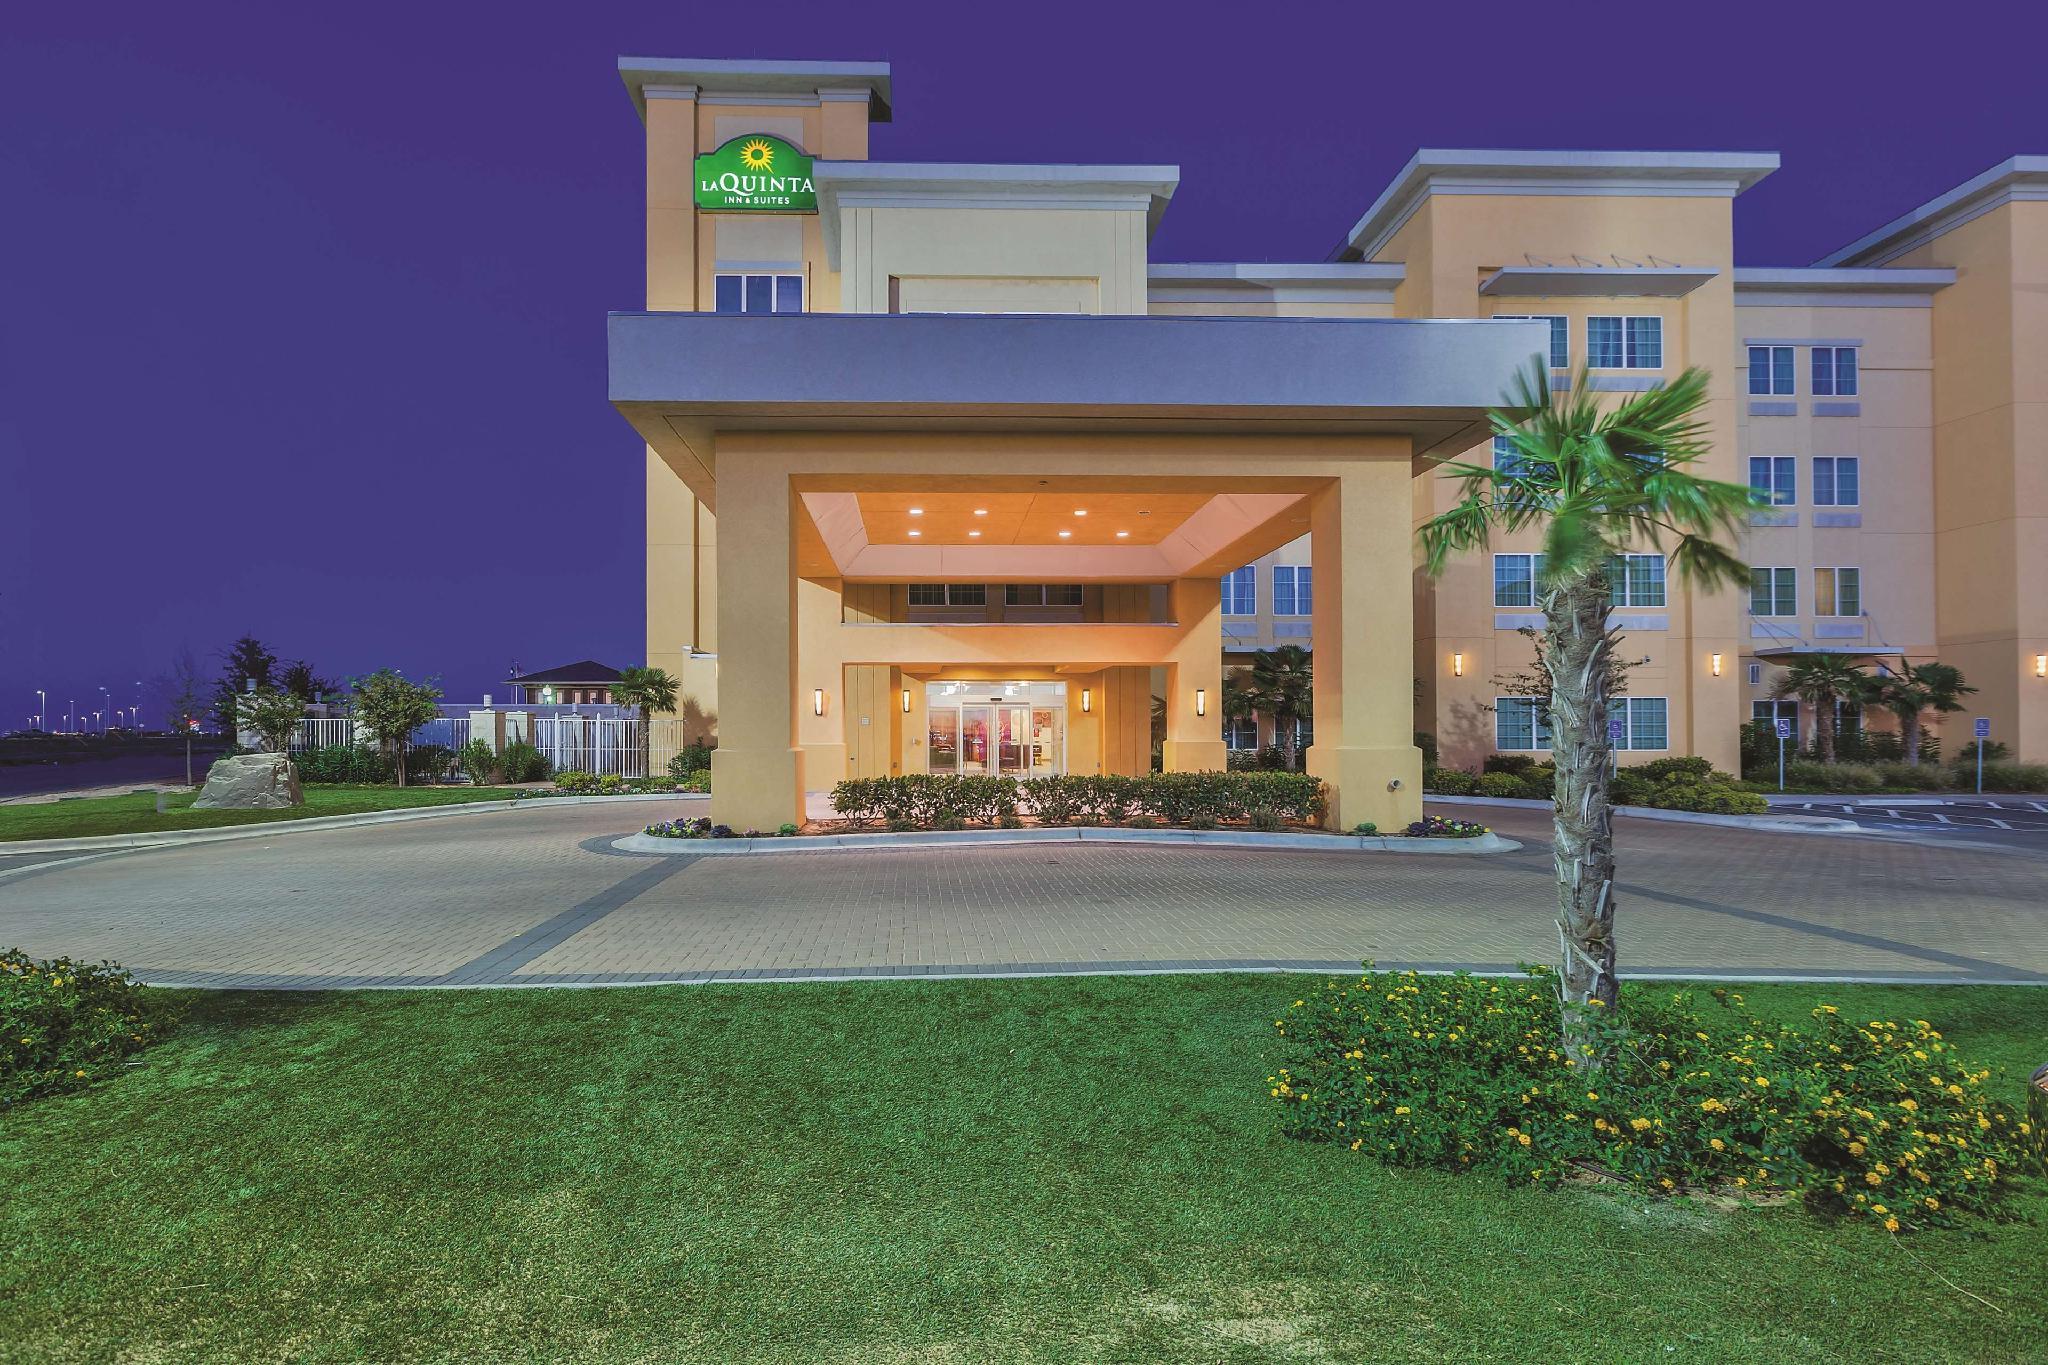 La Quinta Inn And Suites By Wyndham Odessa North